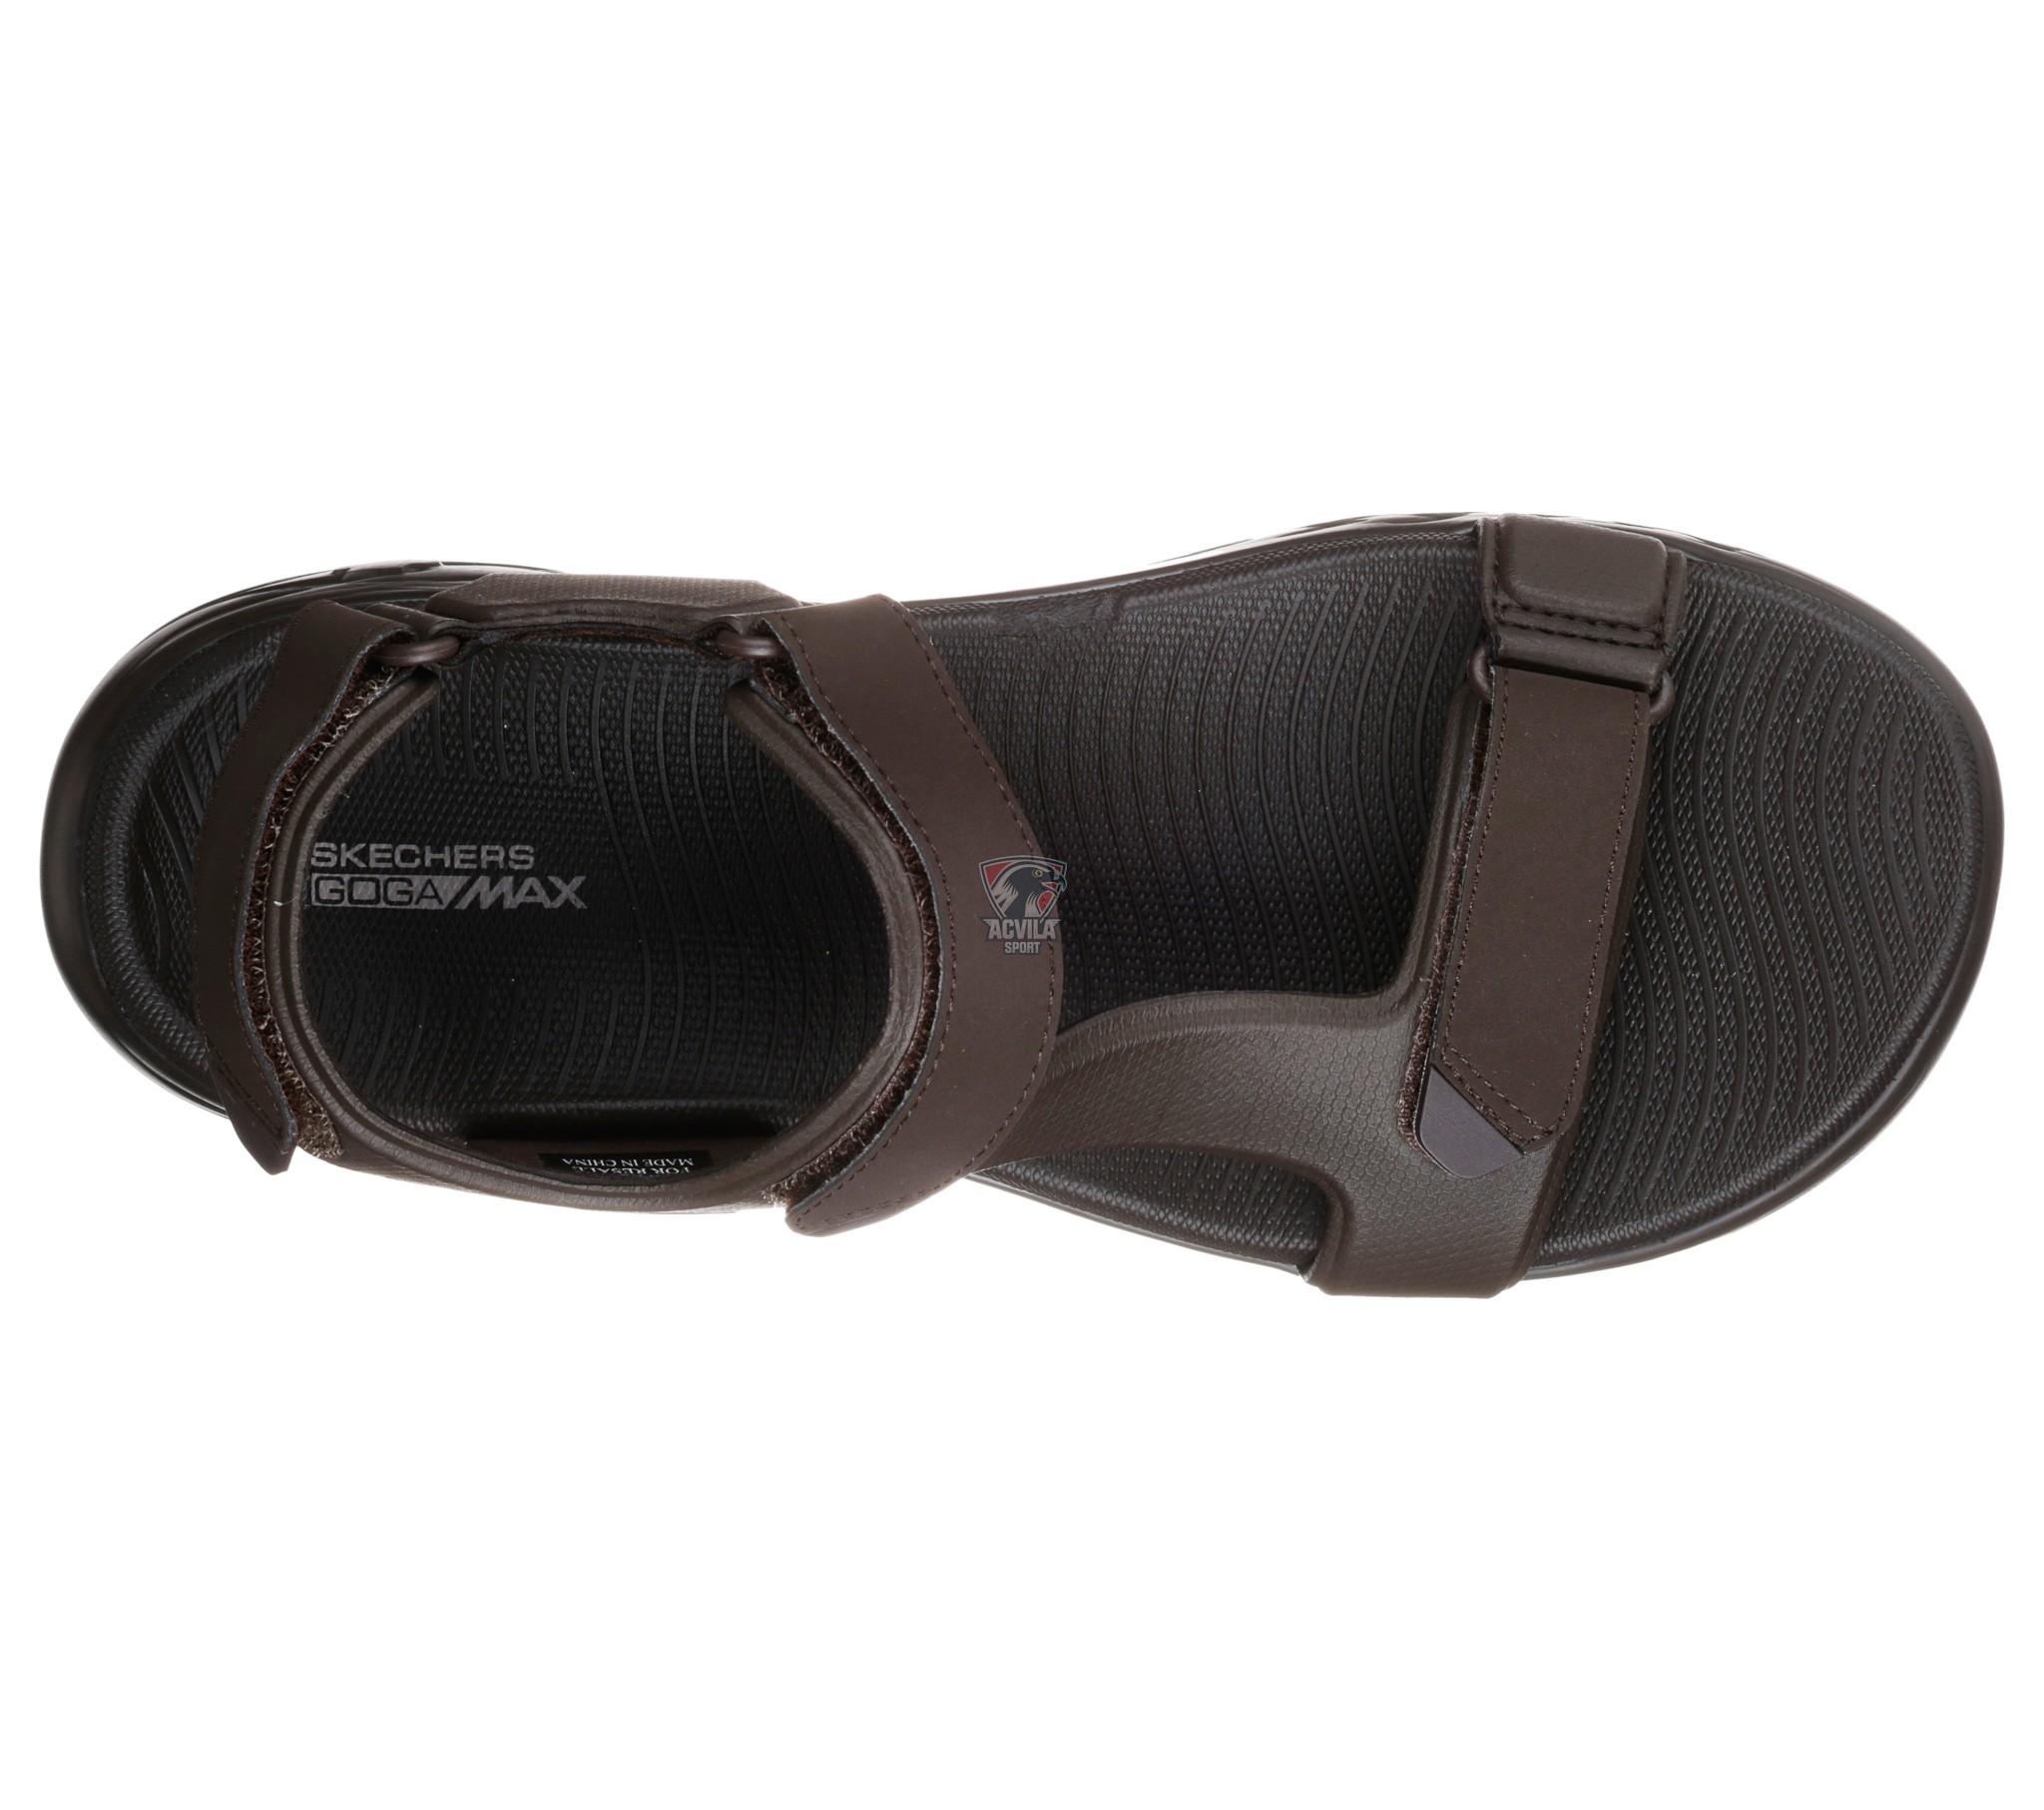 photo 2 Спортивная обувь SKECHERS ON THE GO 600